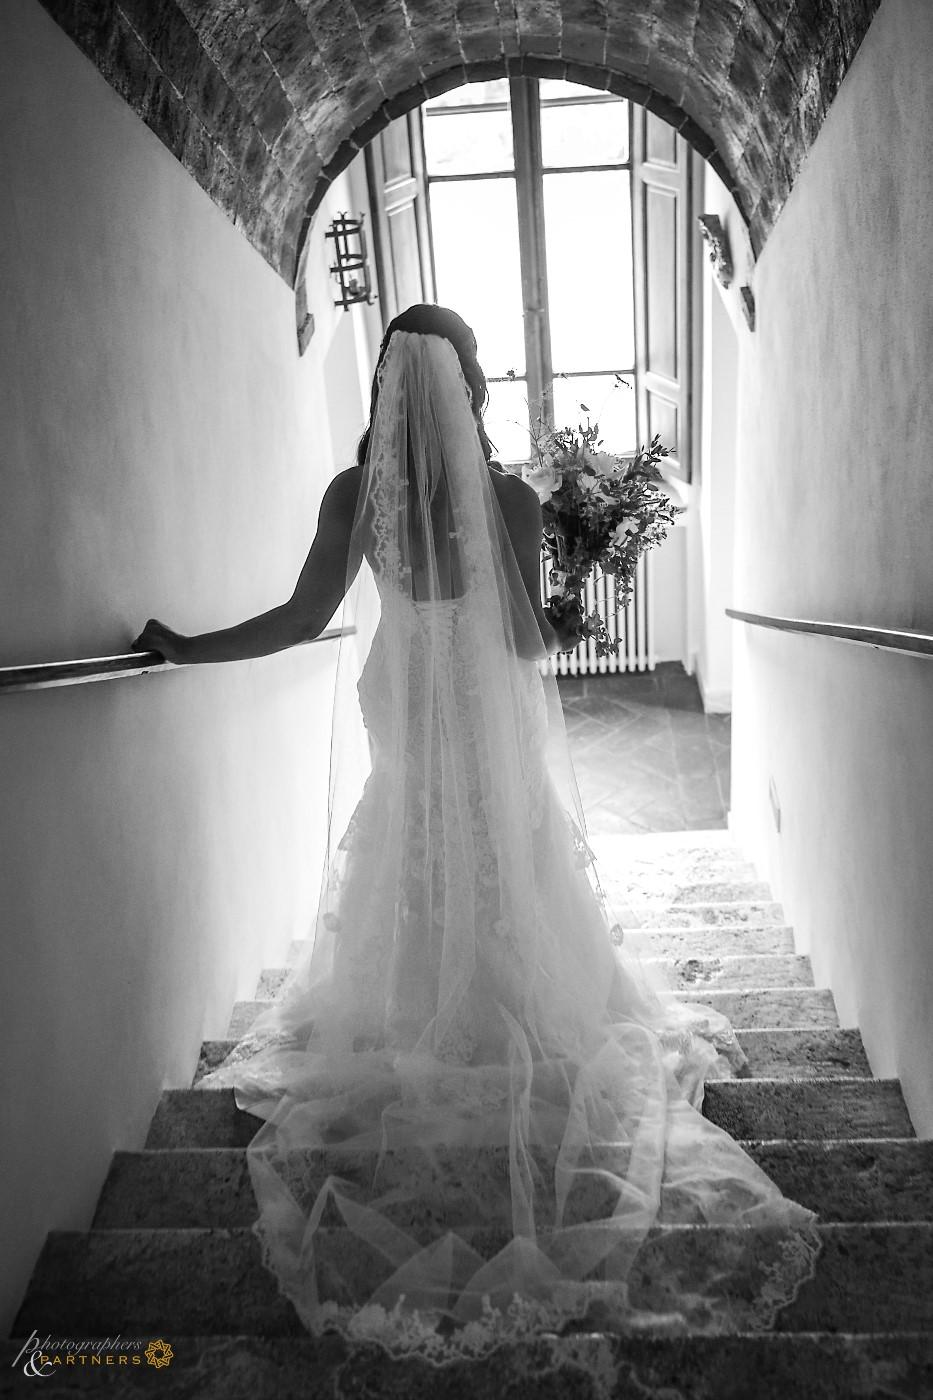 wedding_photographer_montepulciano_07.jpg